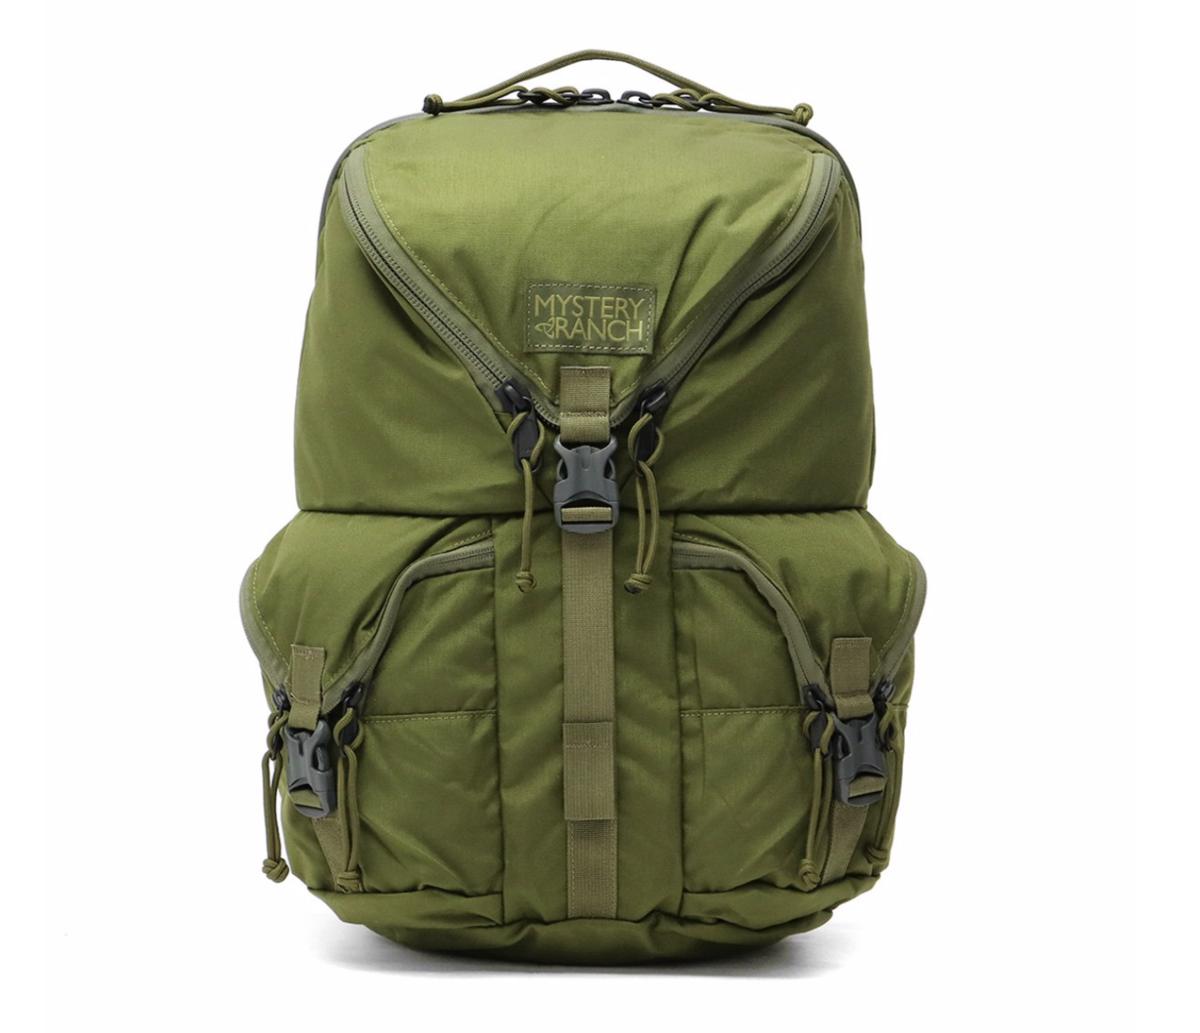 f:id:thebackpack:20190313223506p:plain